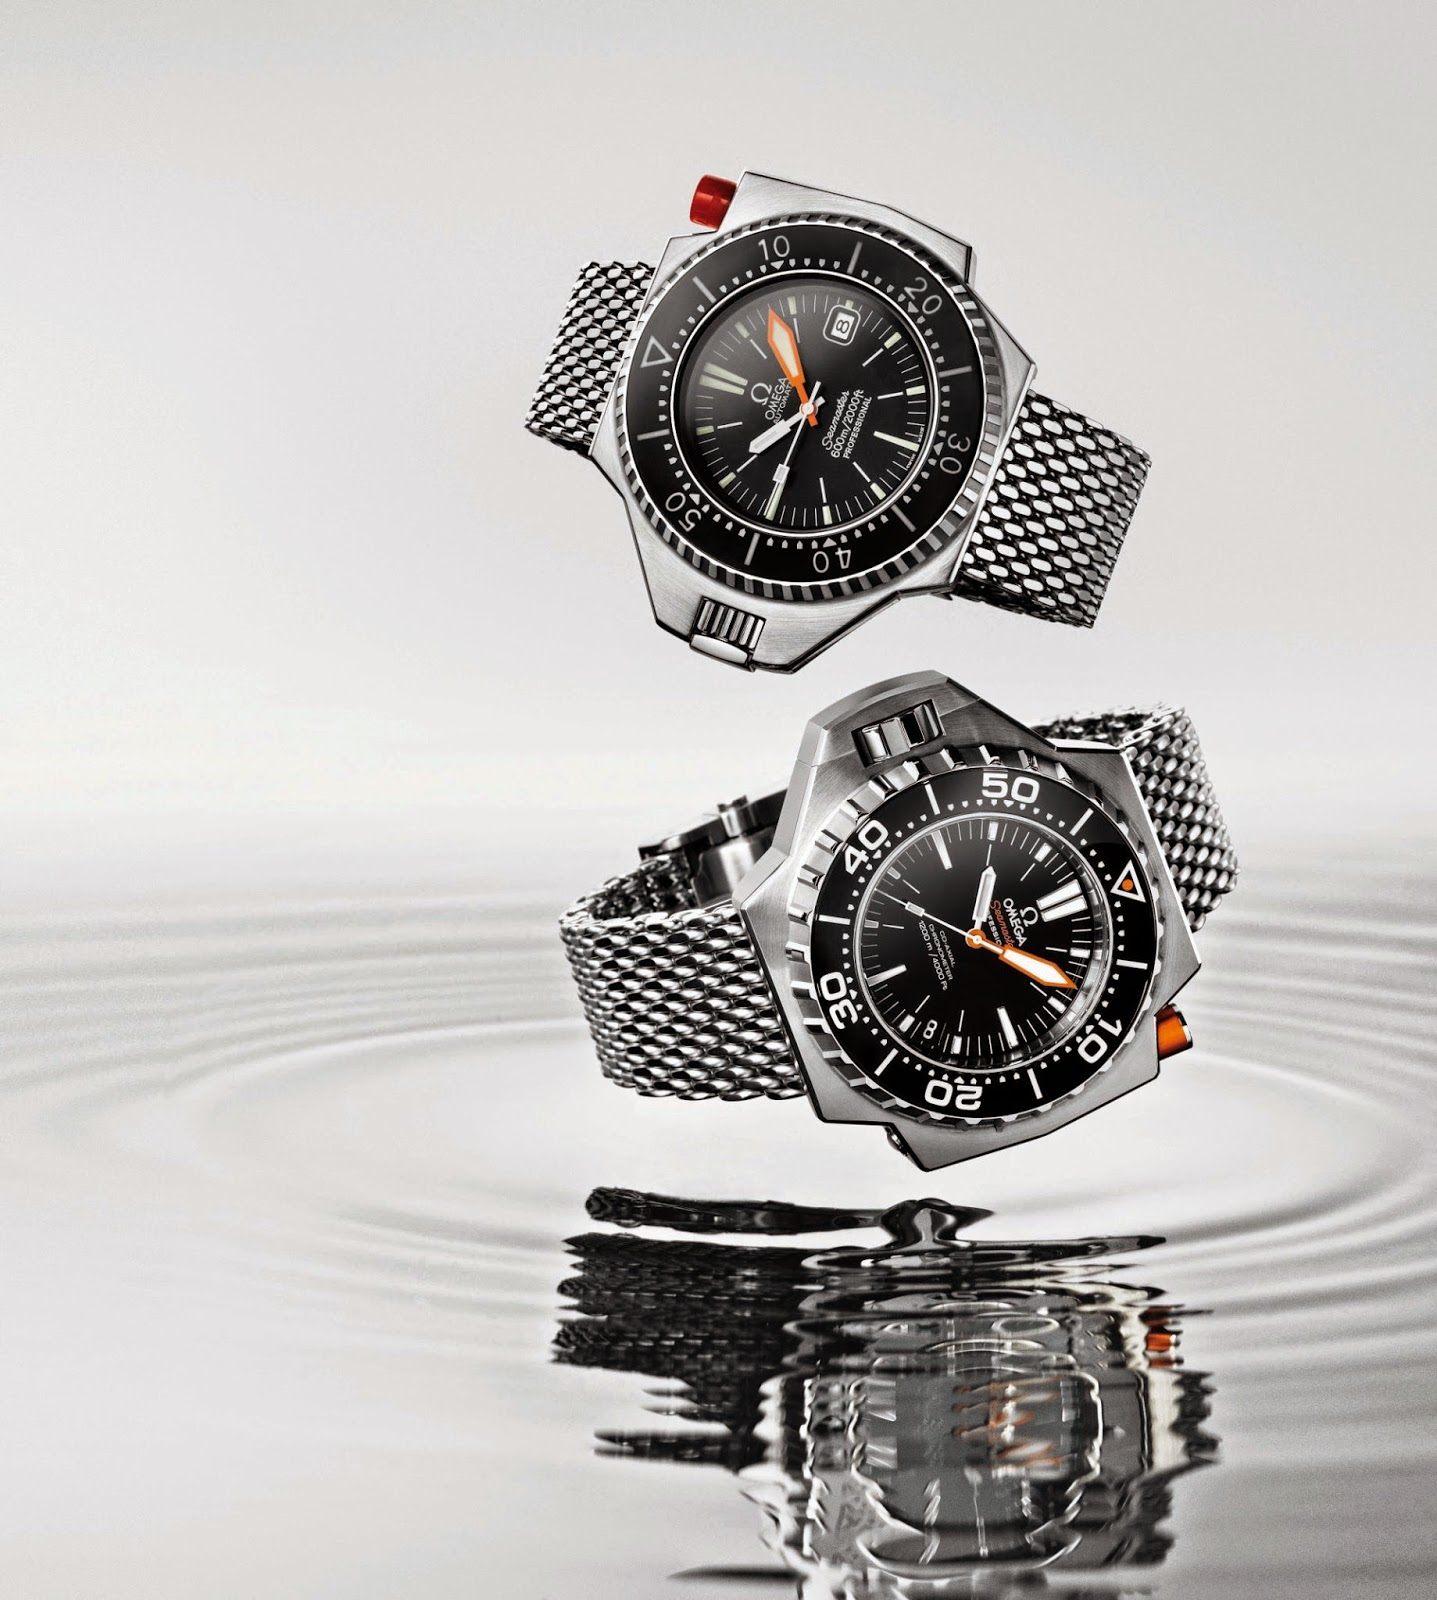 Omega Omega Seamaster Ploprof 1200M replica watch